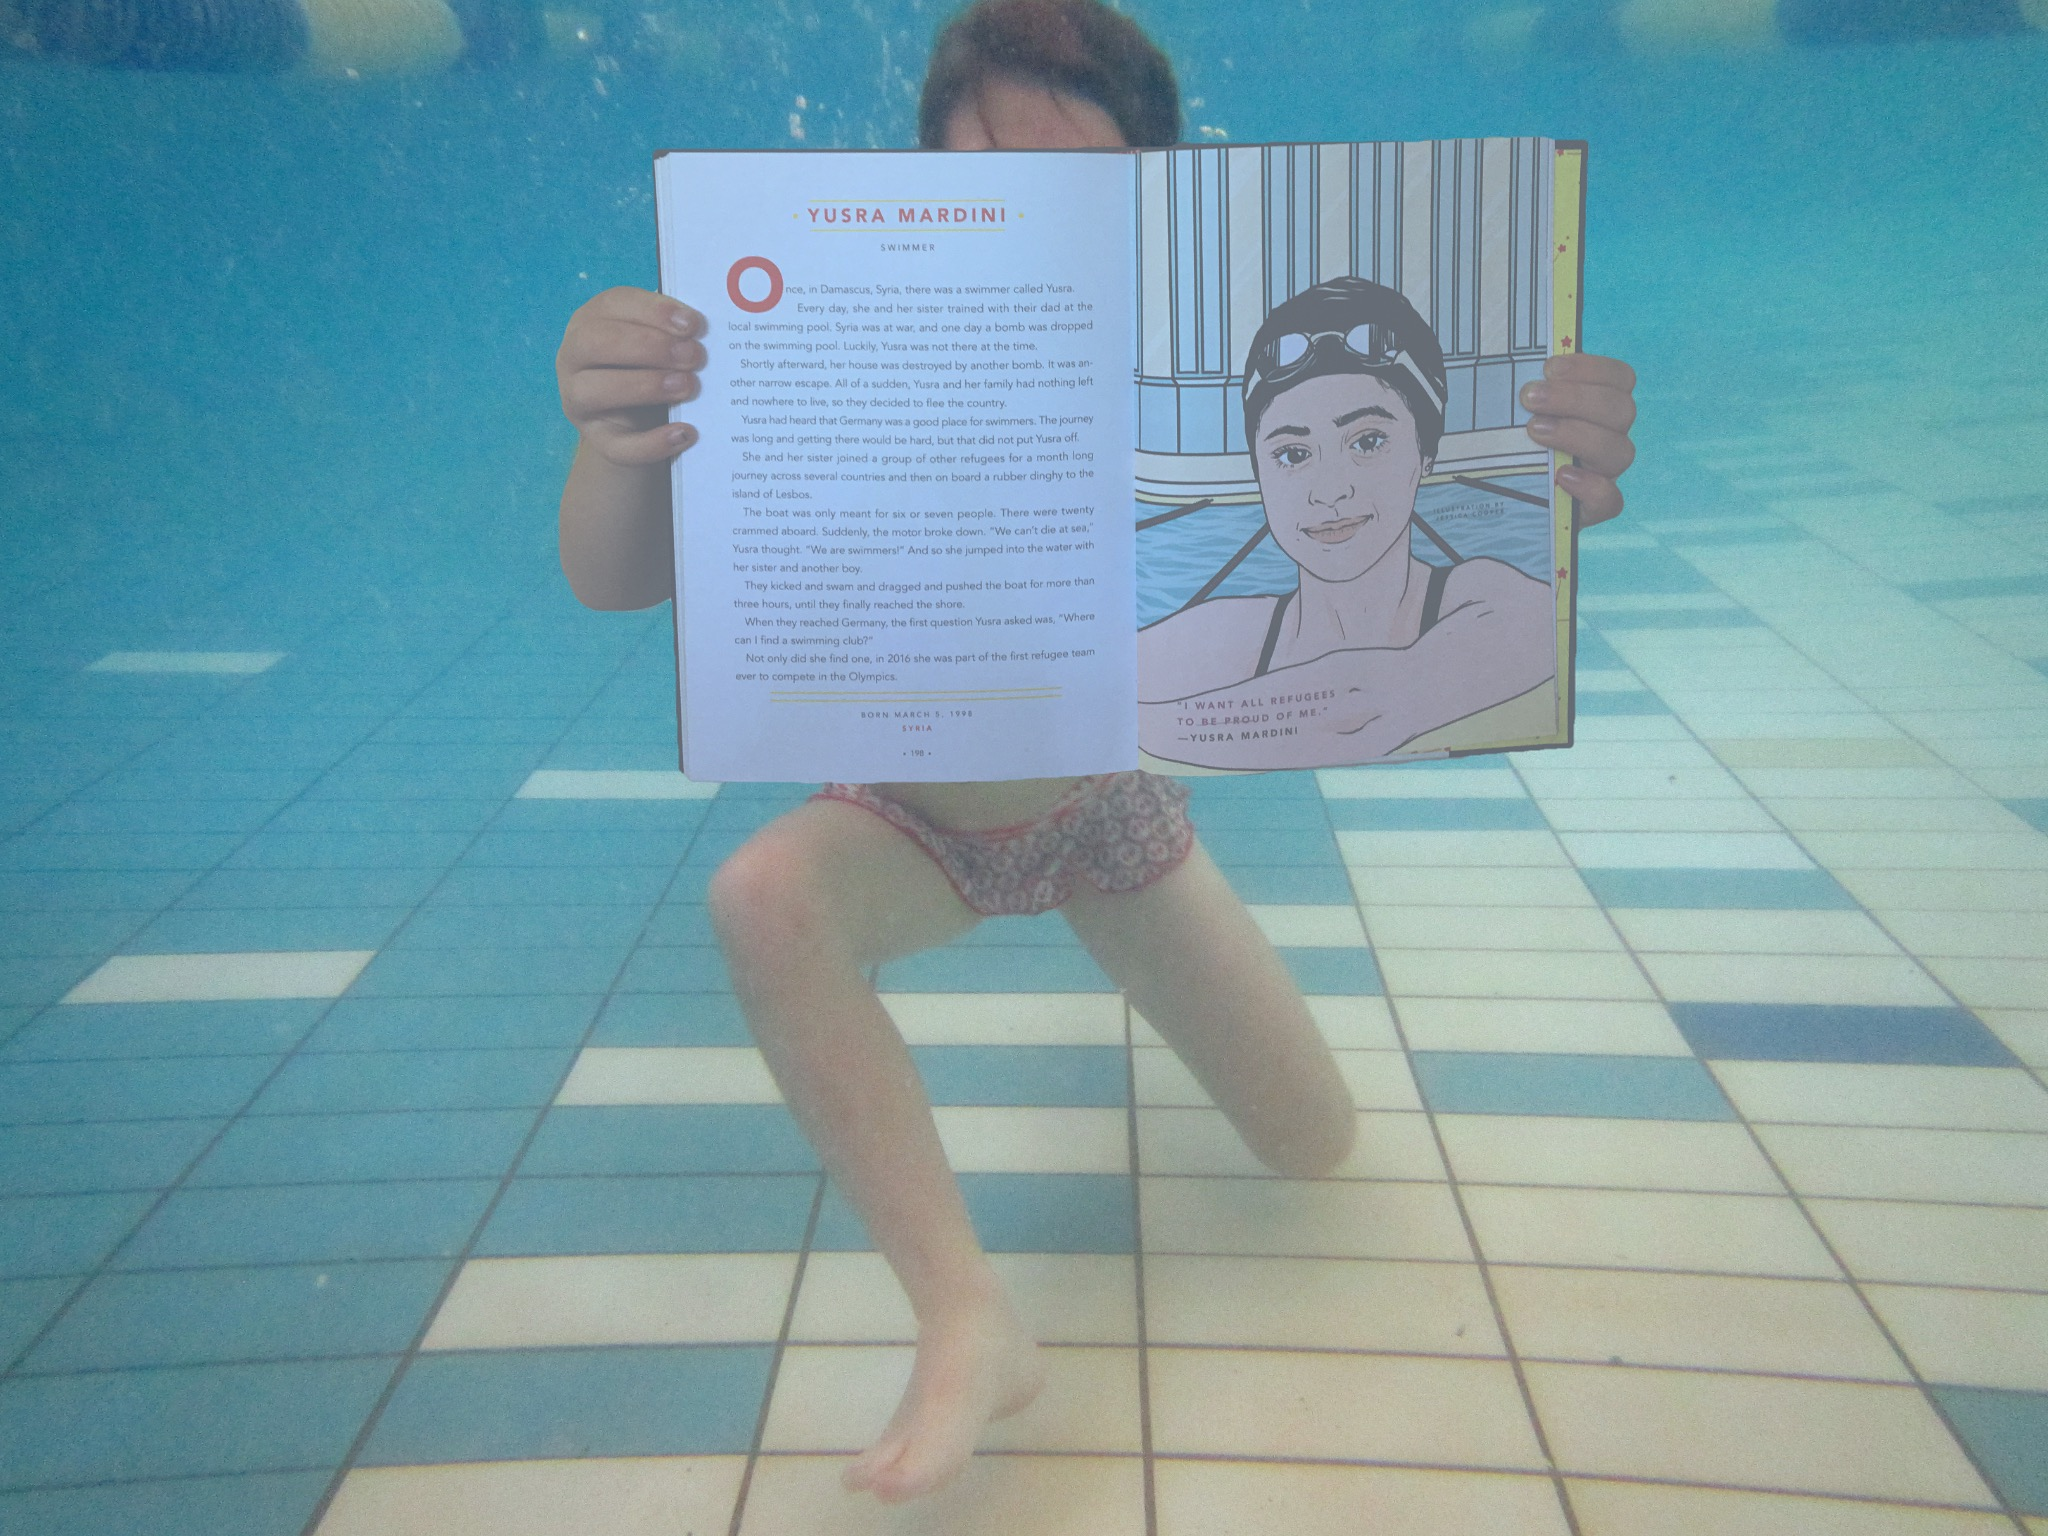 Local swimming pool, Yusra Mardini